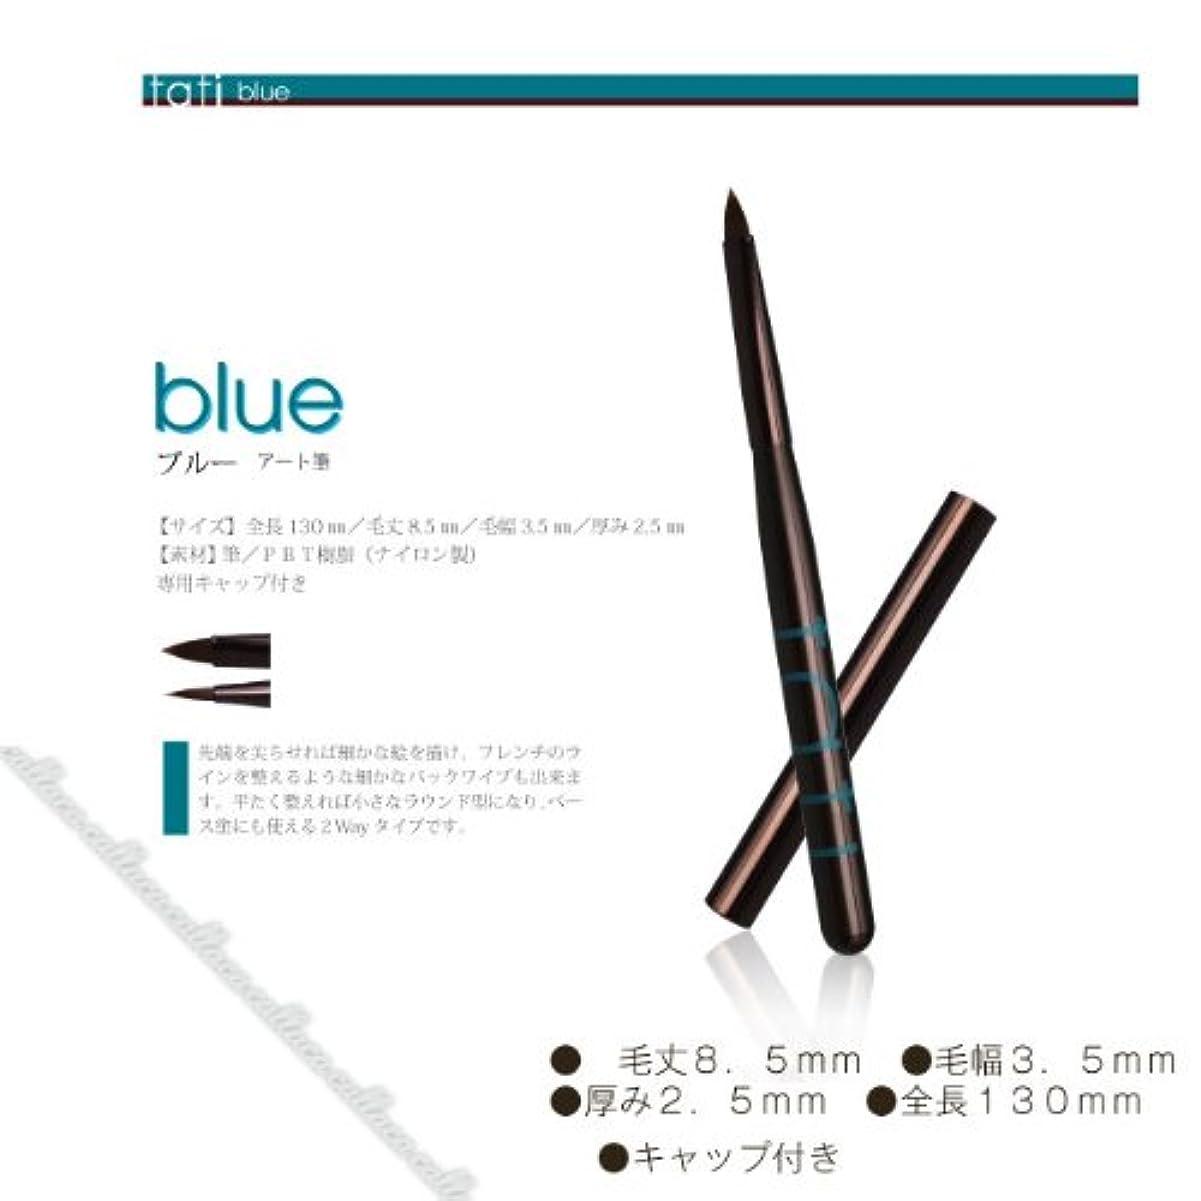 tati ジェル ブラシアートショコラ blue(ブルー)